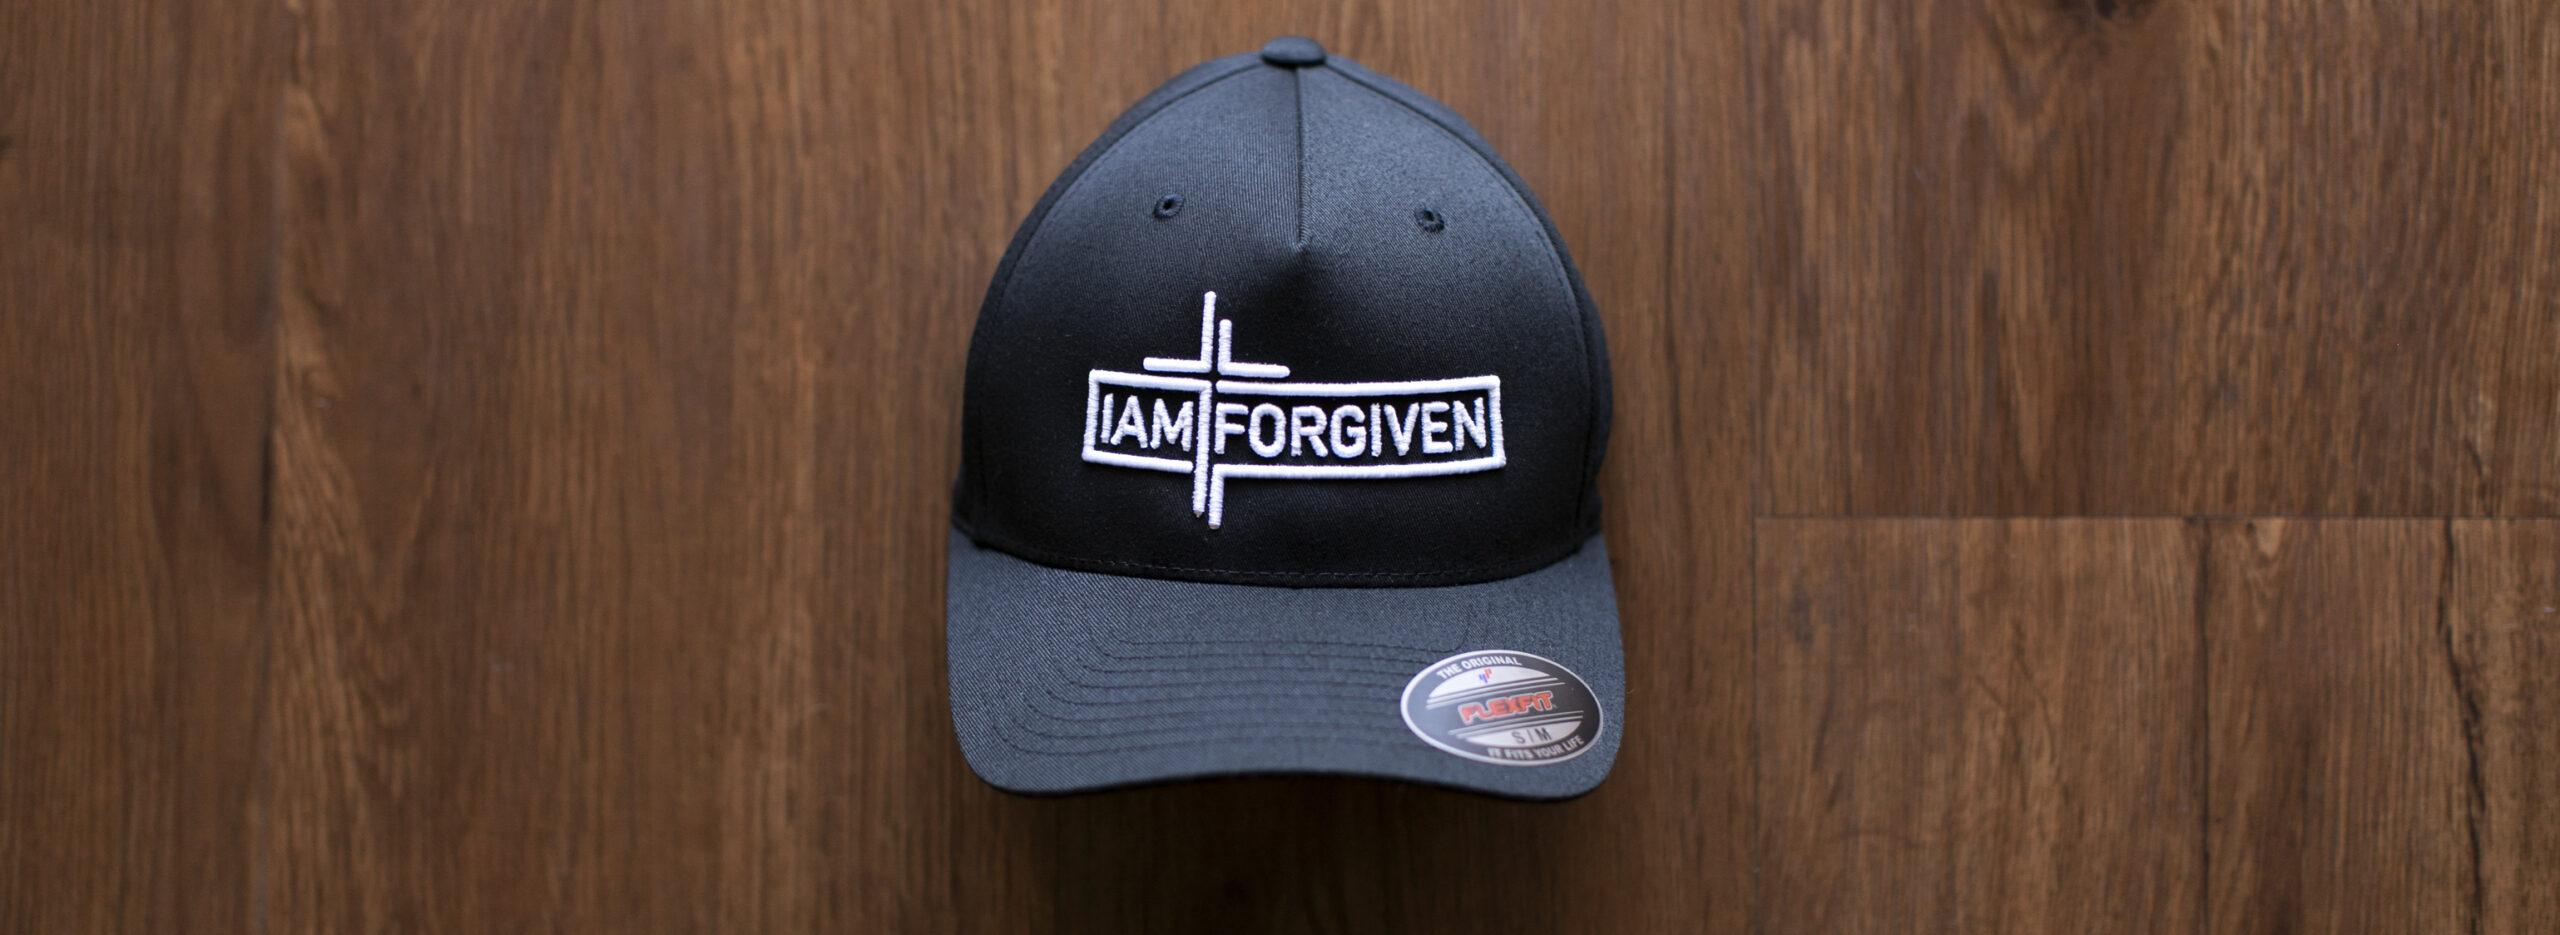 IAMFORGIVEN - Black Flexfit Hat